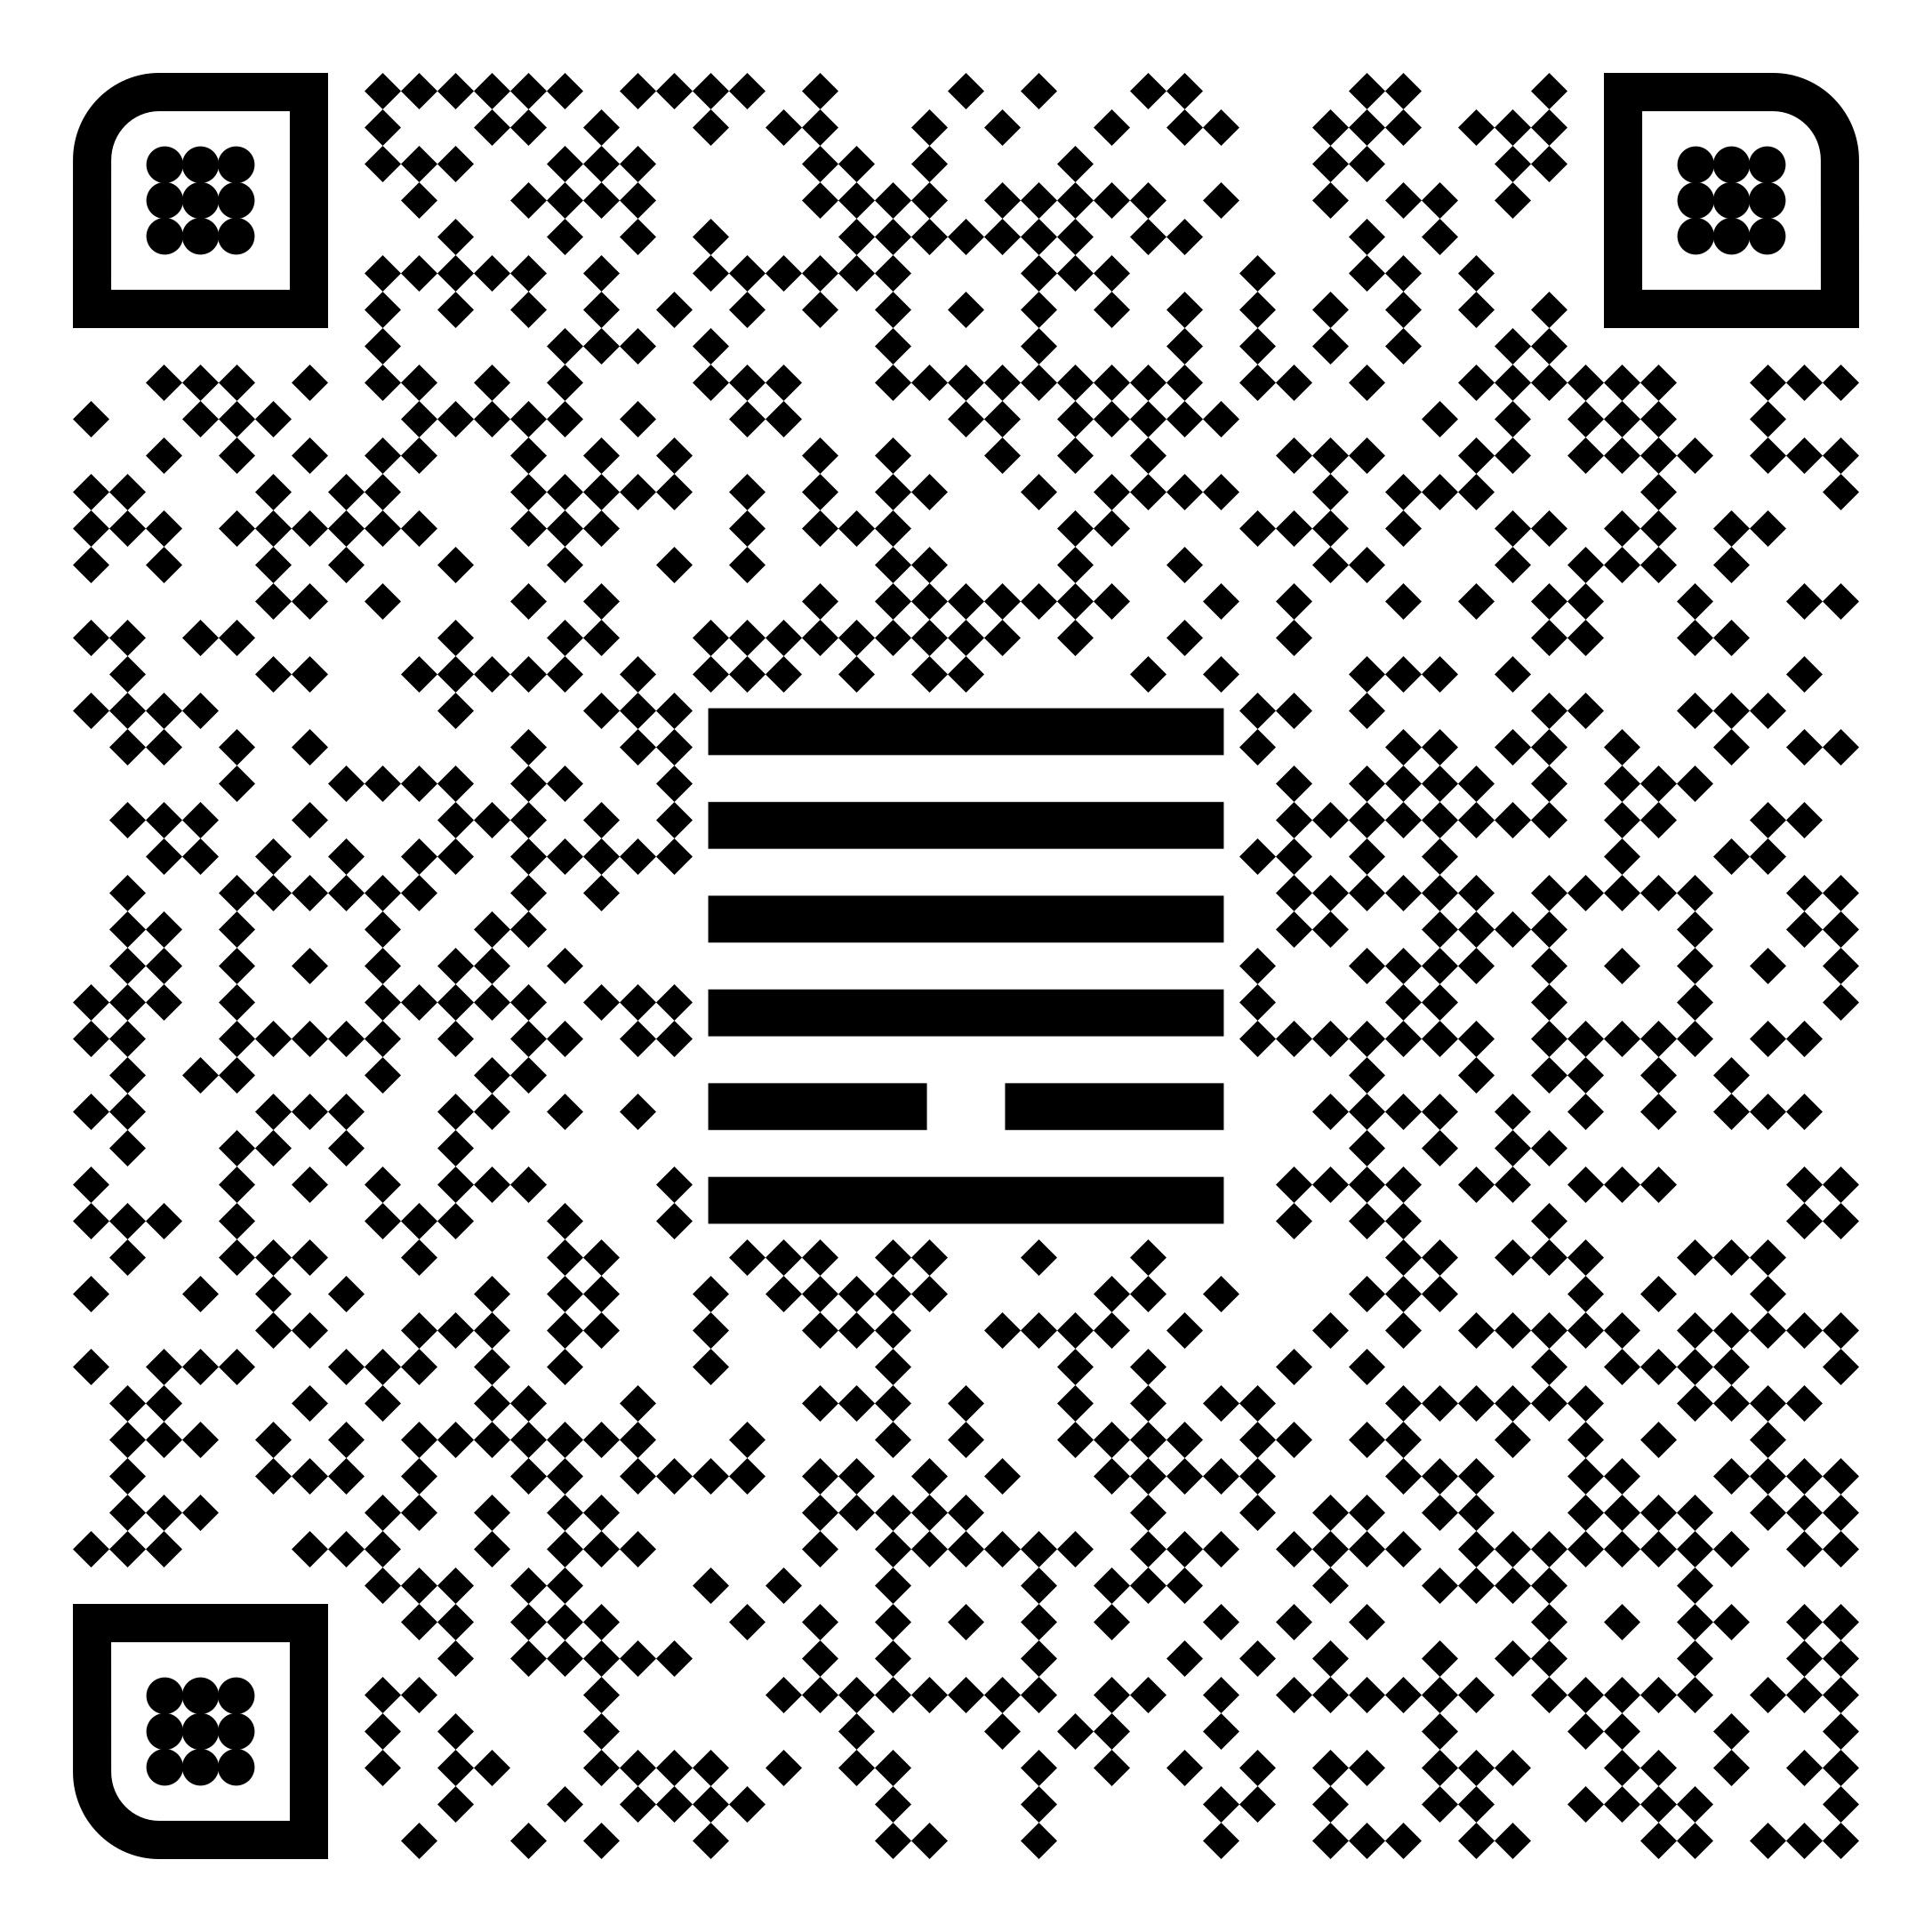 qr-code-13.png